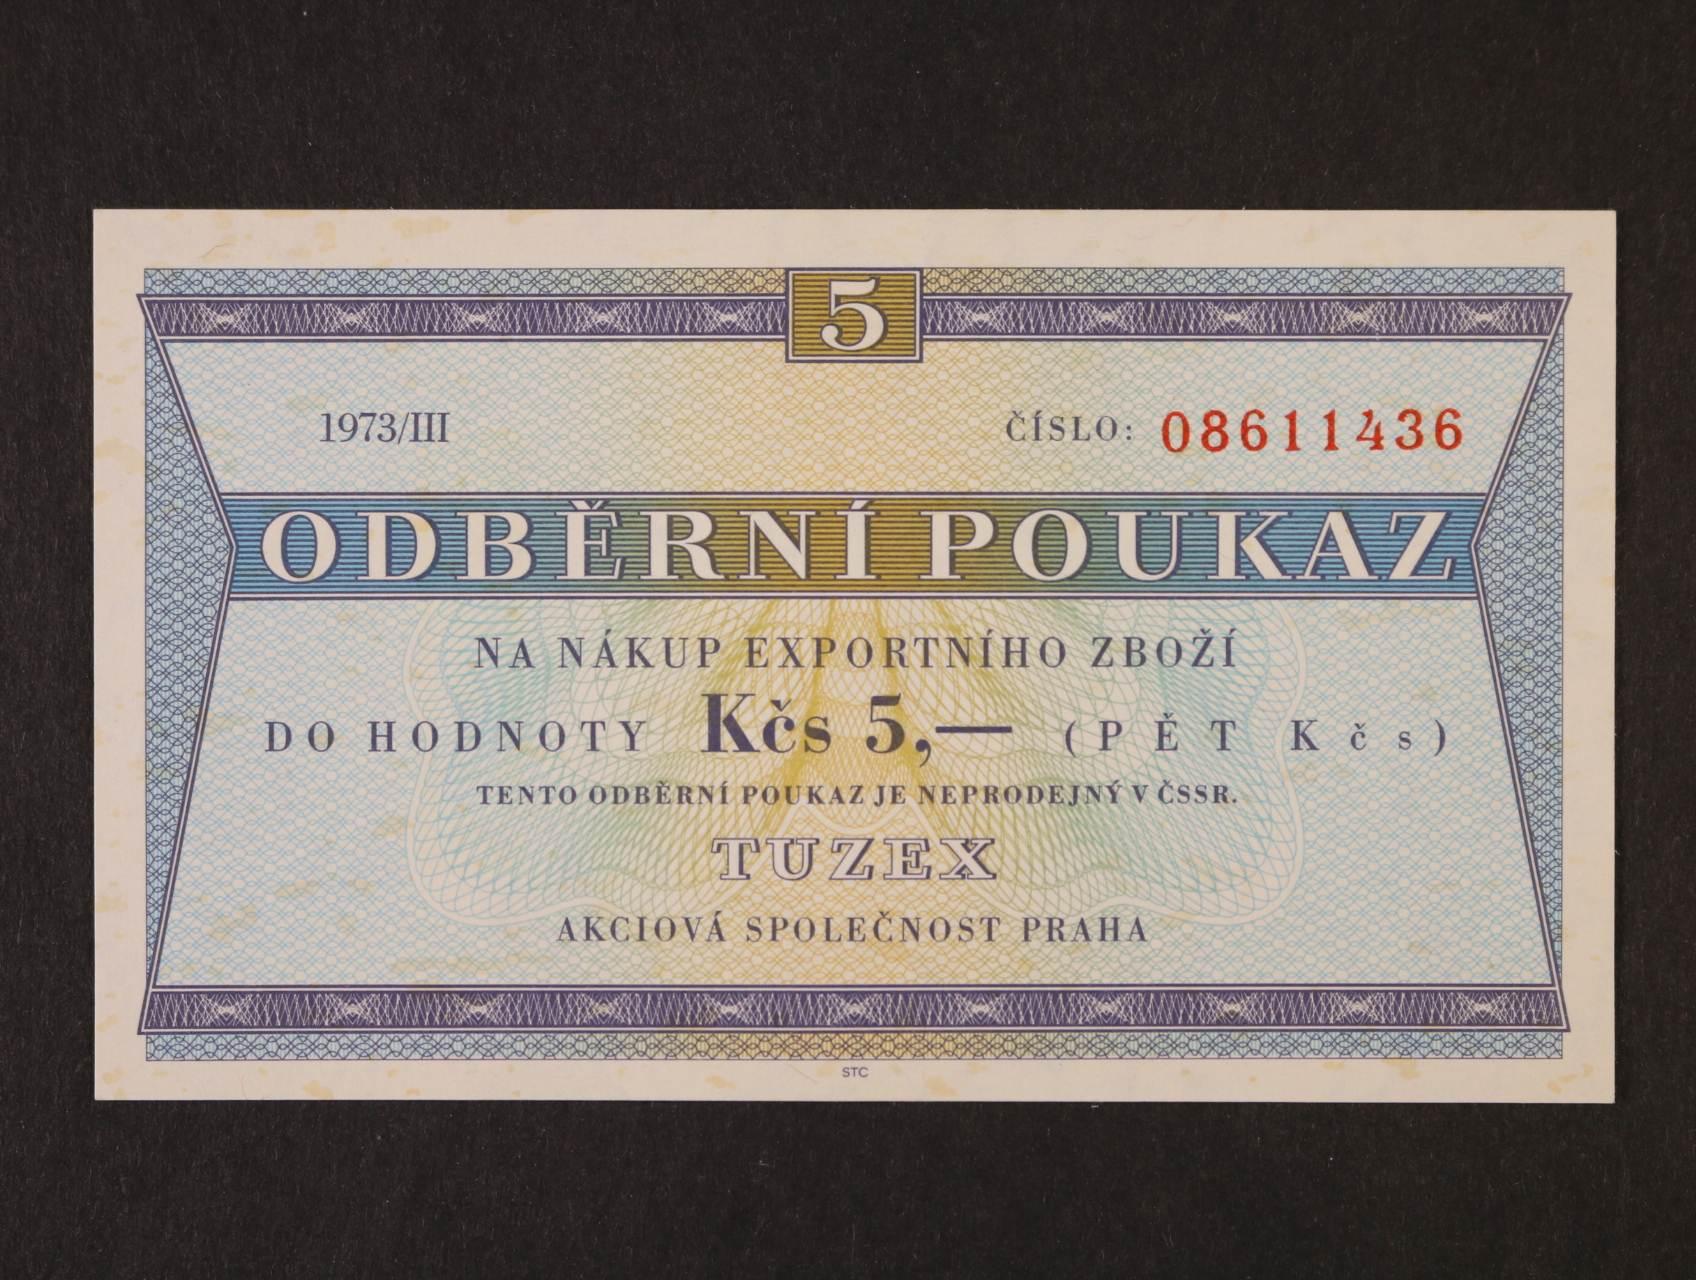 Tuzex, 5 TKčs s datem 1973/III, K.Š.K. 42/VI/a